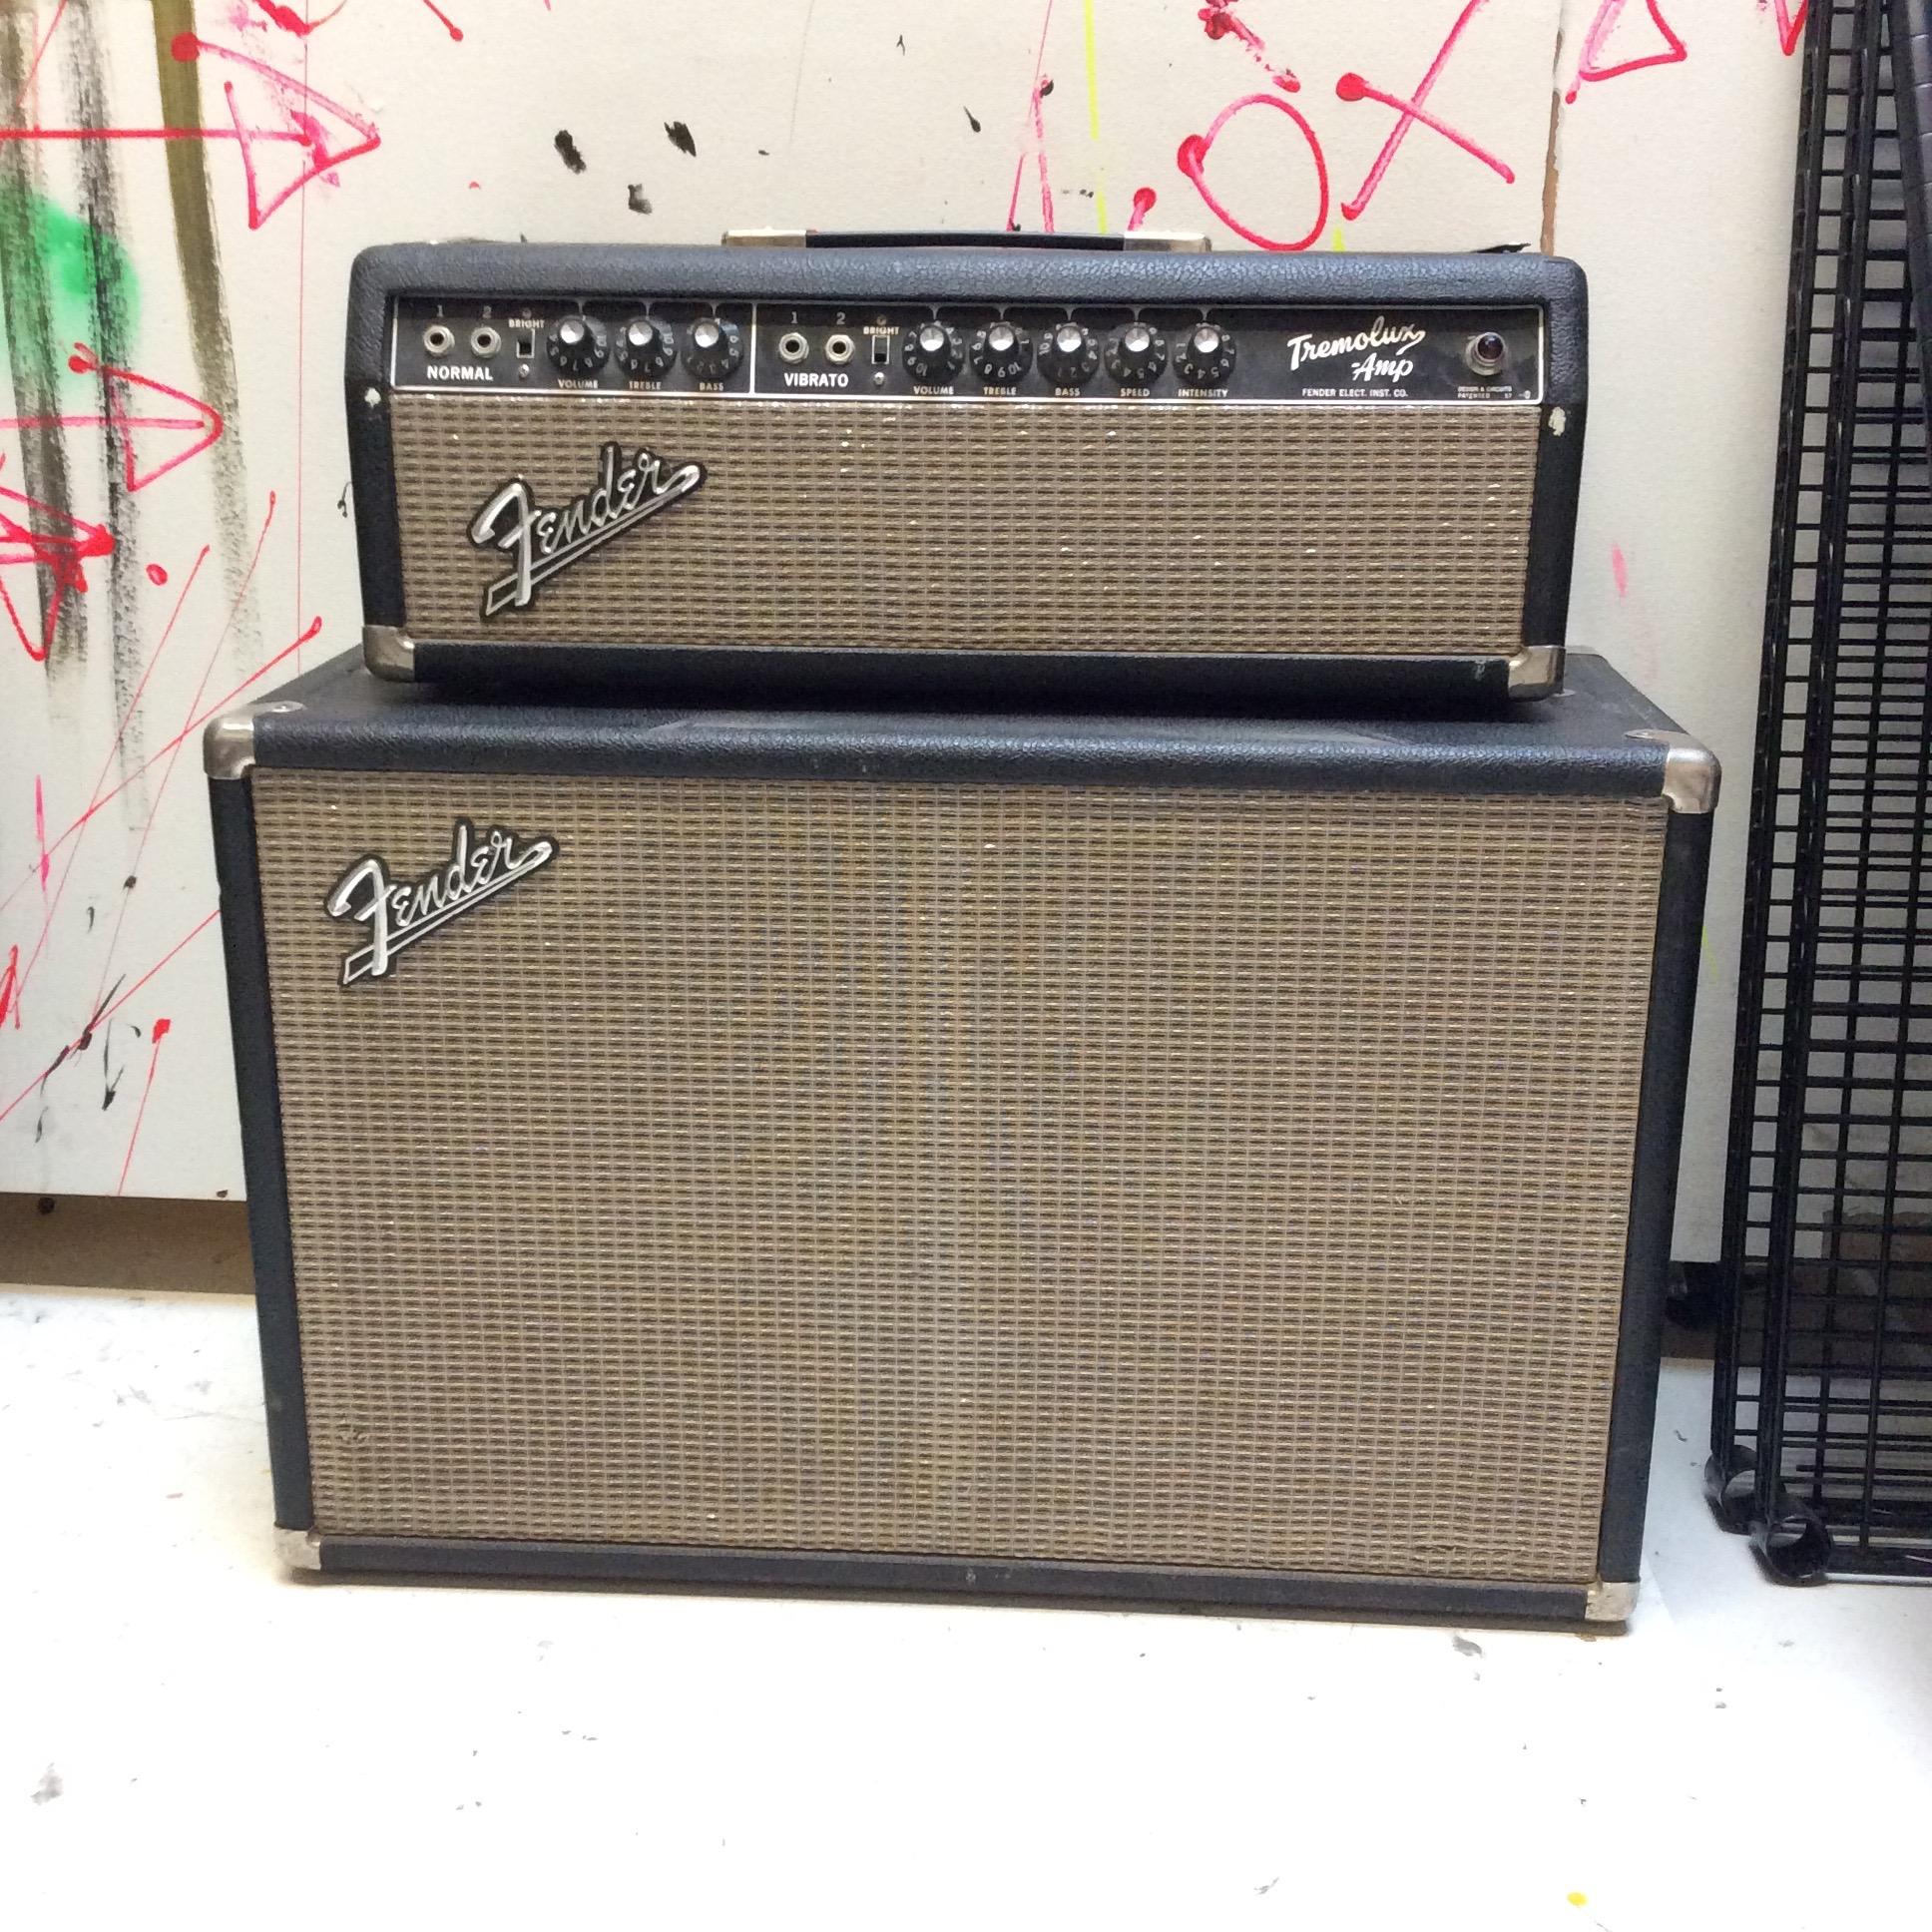 2x12 Fender Cab (Bottom)  Notes: